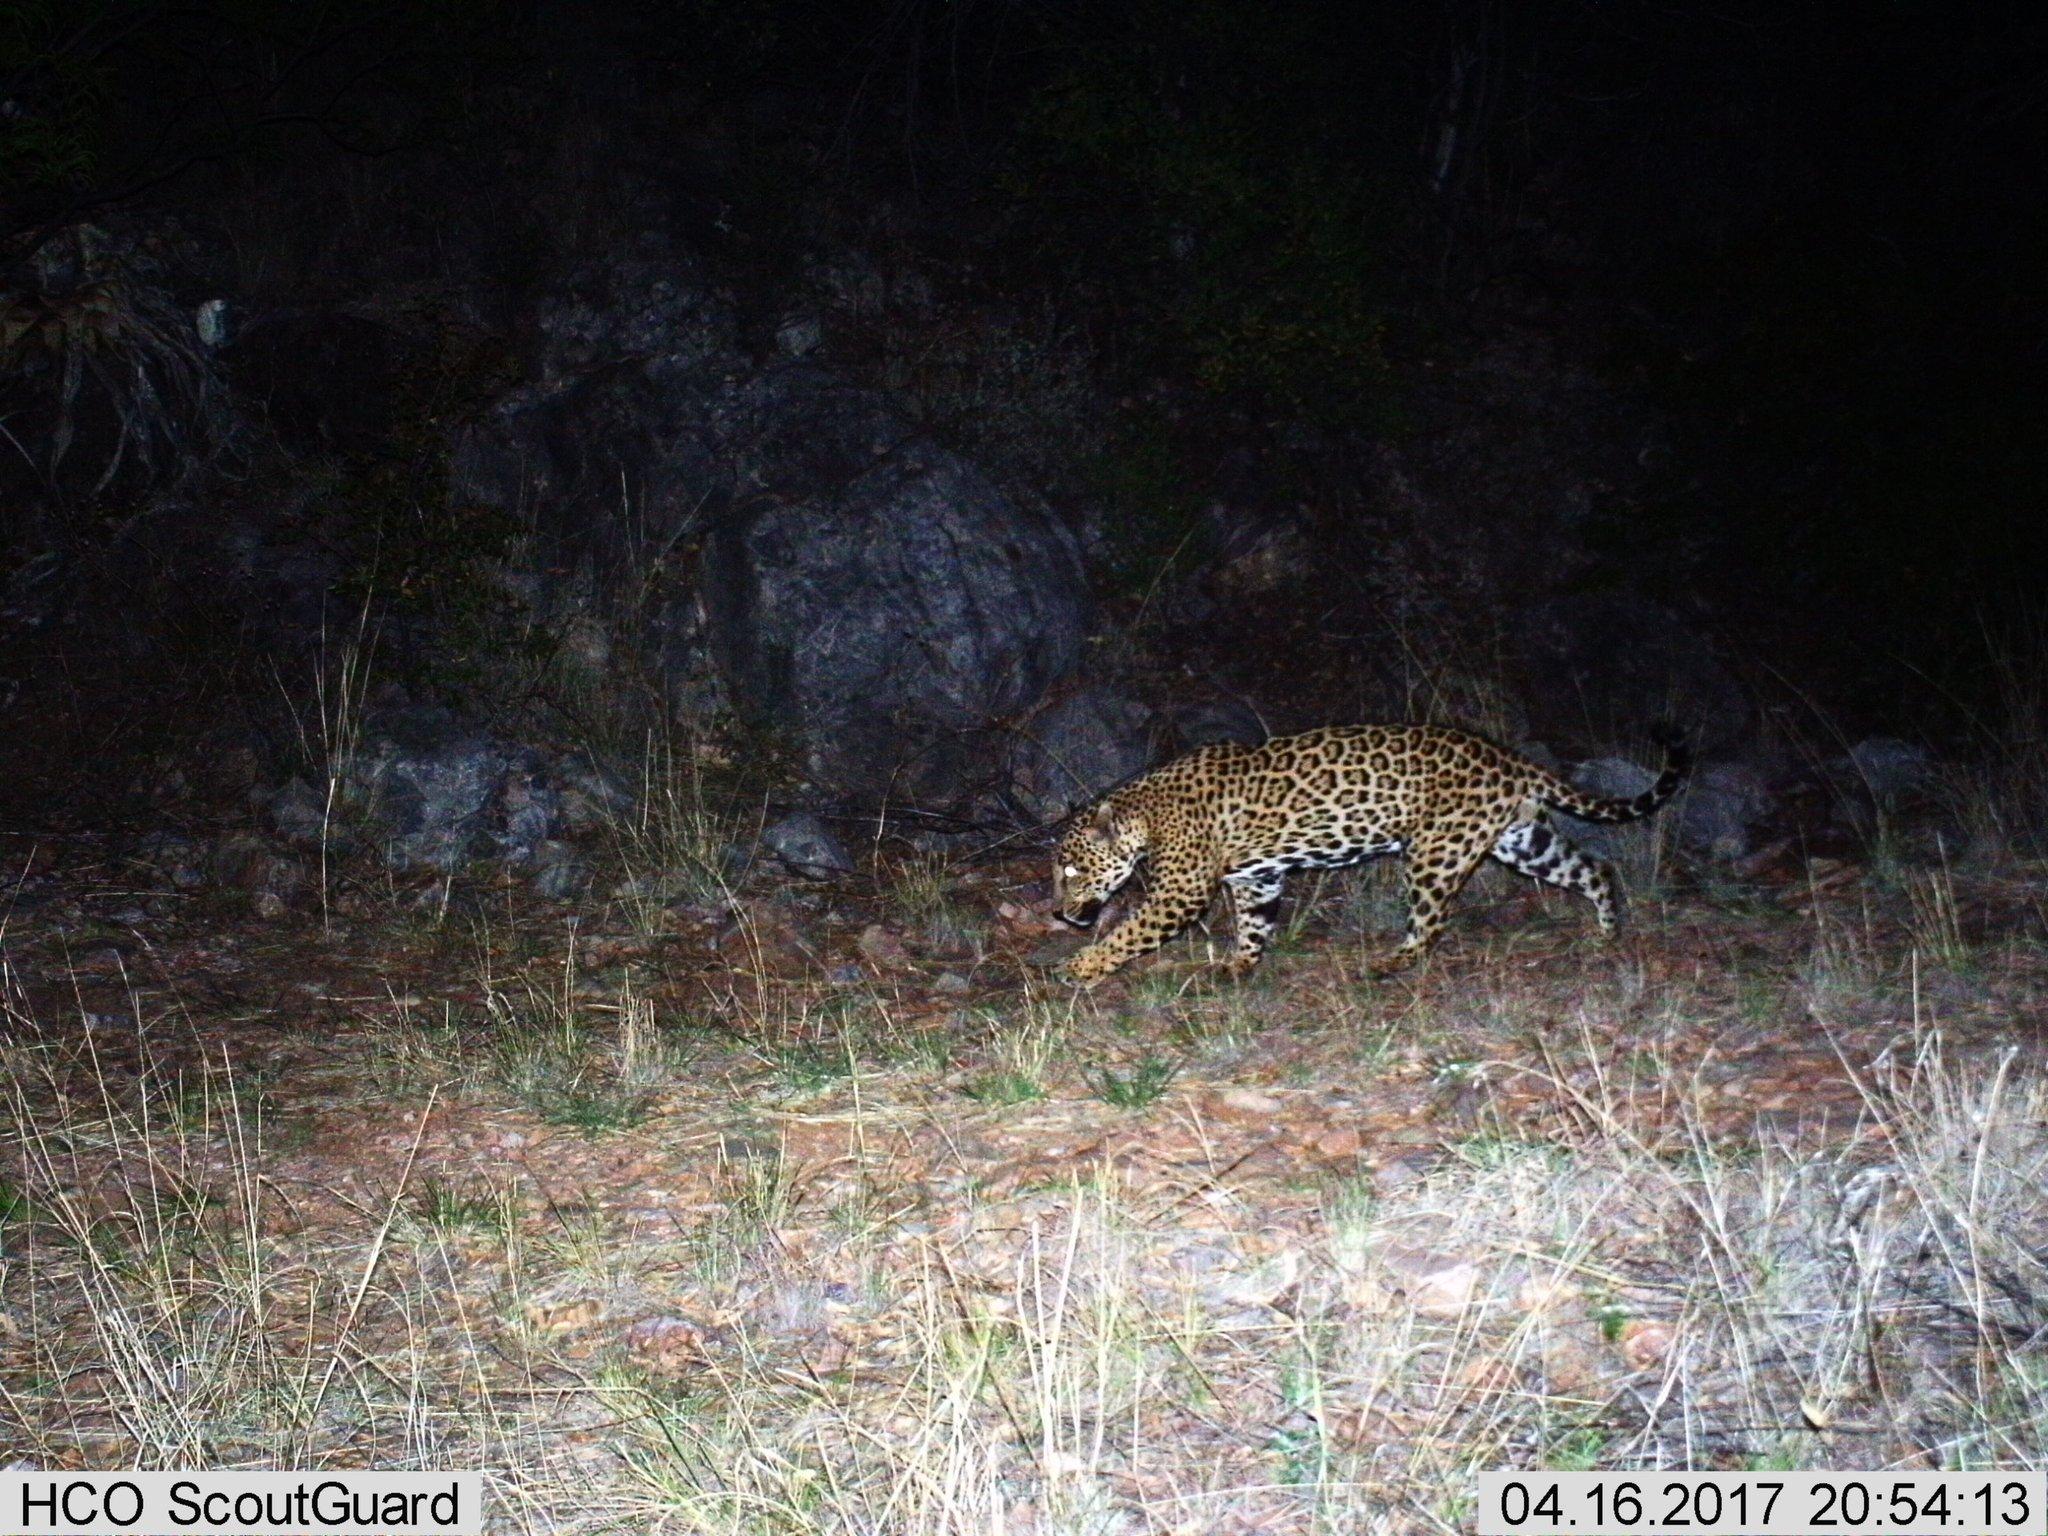 video: wild jaguar 'sombra' seen again in s. az mountains, confirmed